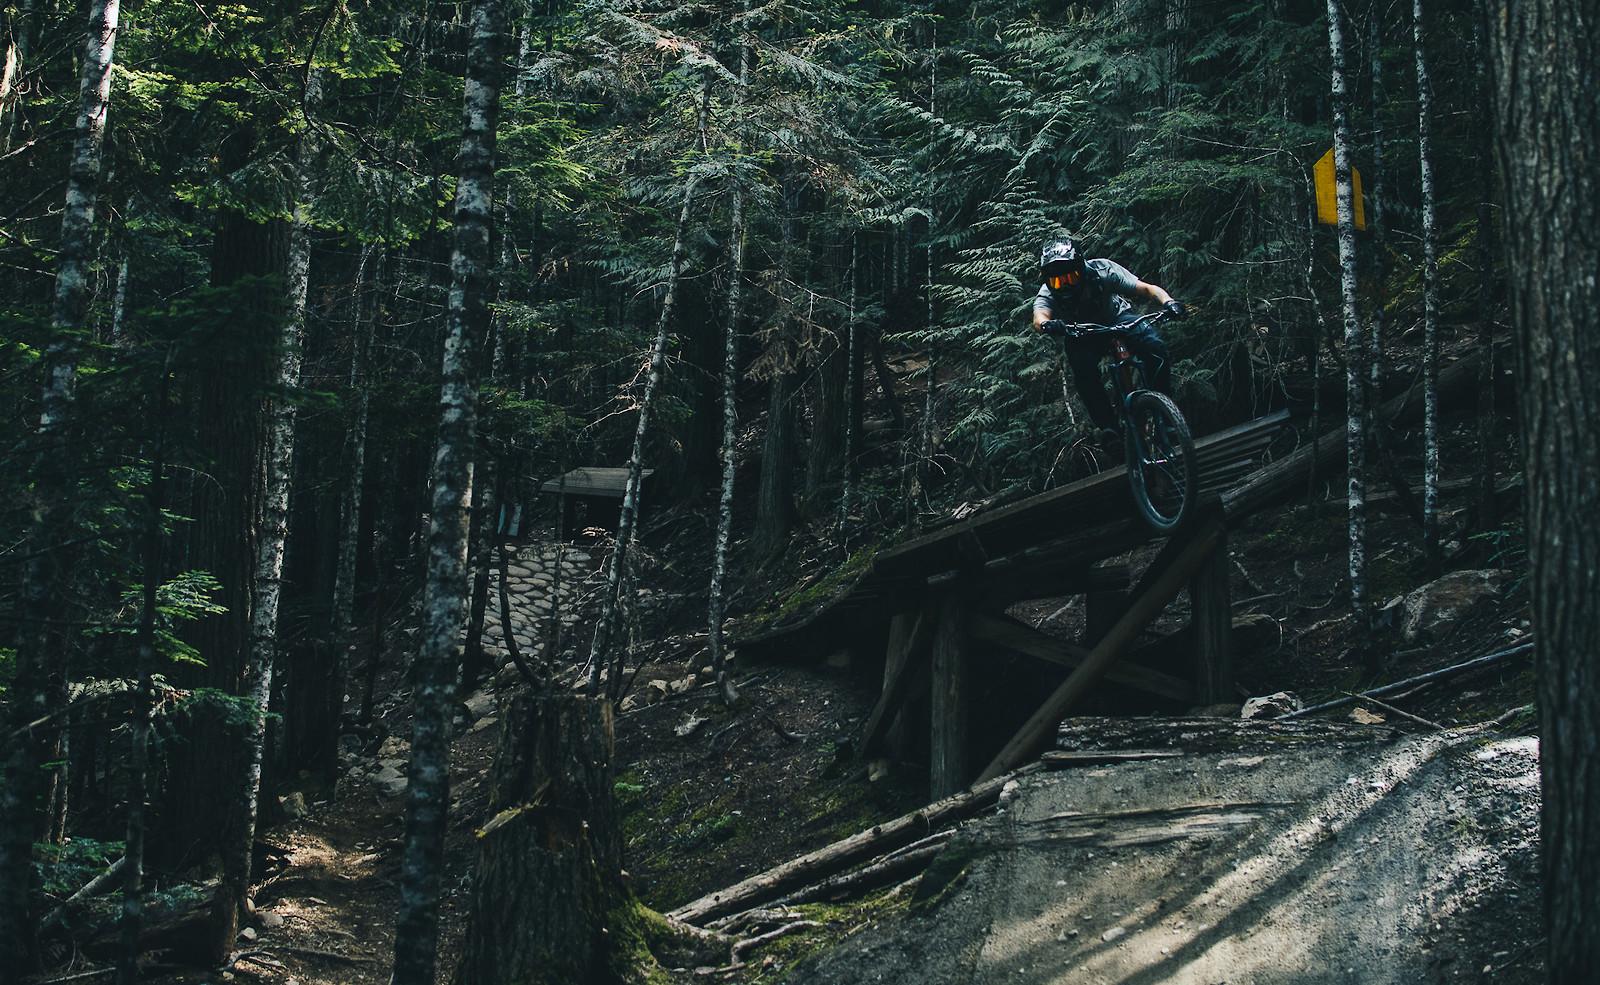 Clown shoes Whistler Mountain Bike Park on hardtail - Banan - Mountain Biking Pictures - Vital MTB